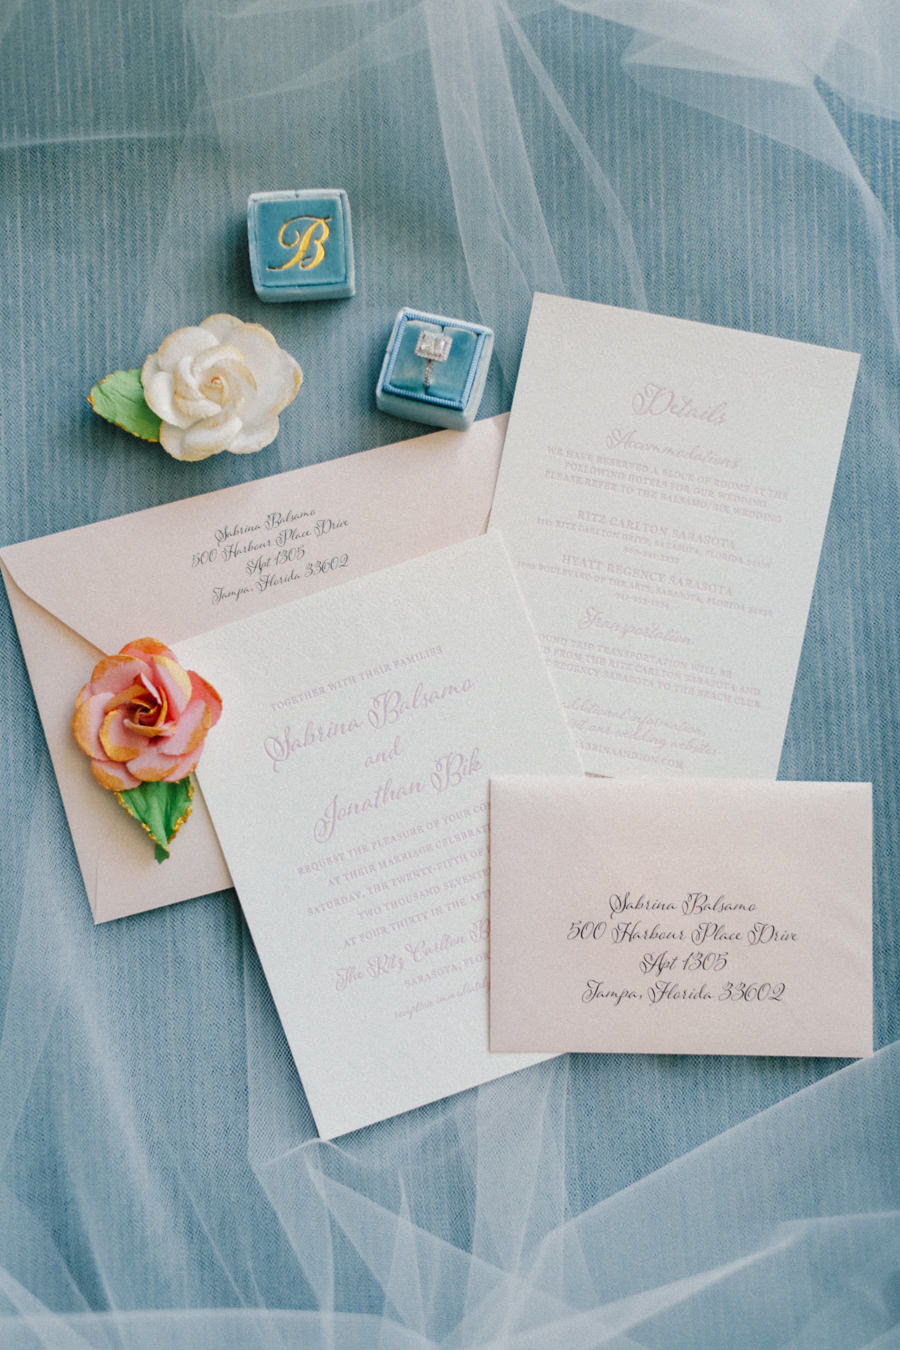 Blush Pink and Cream Wedding Invitation Suite by Tampa Wedding Invitations Designers A&P Design Co